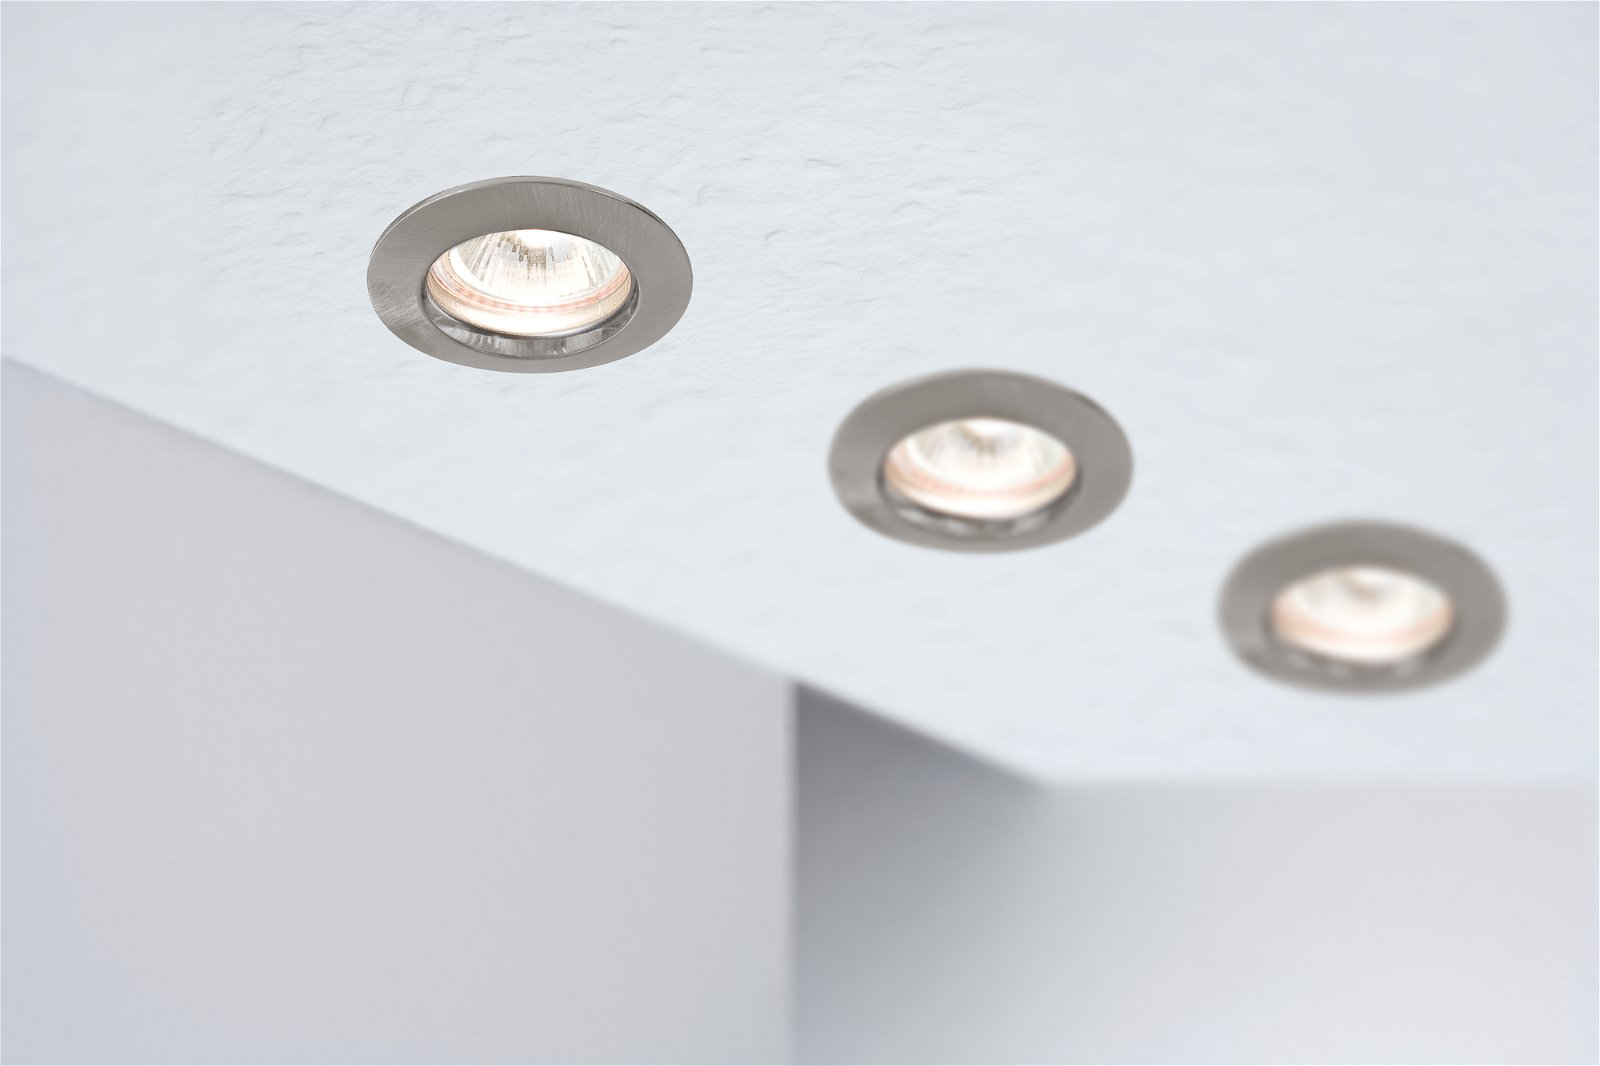 Premium Spot encastré LED IP44 rond 79mm GU10 max. 50W 230V Acier brossé